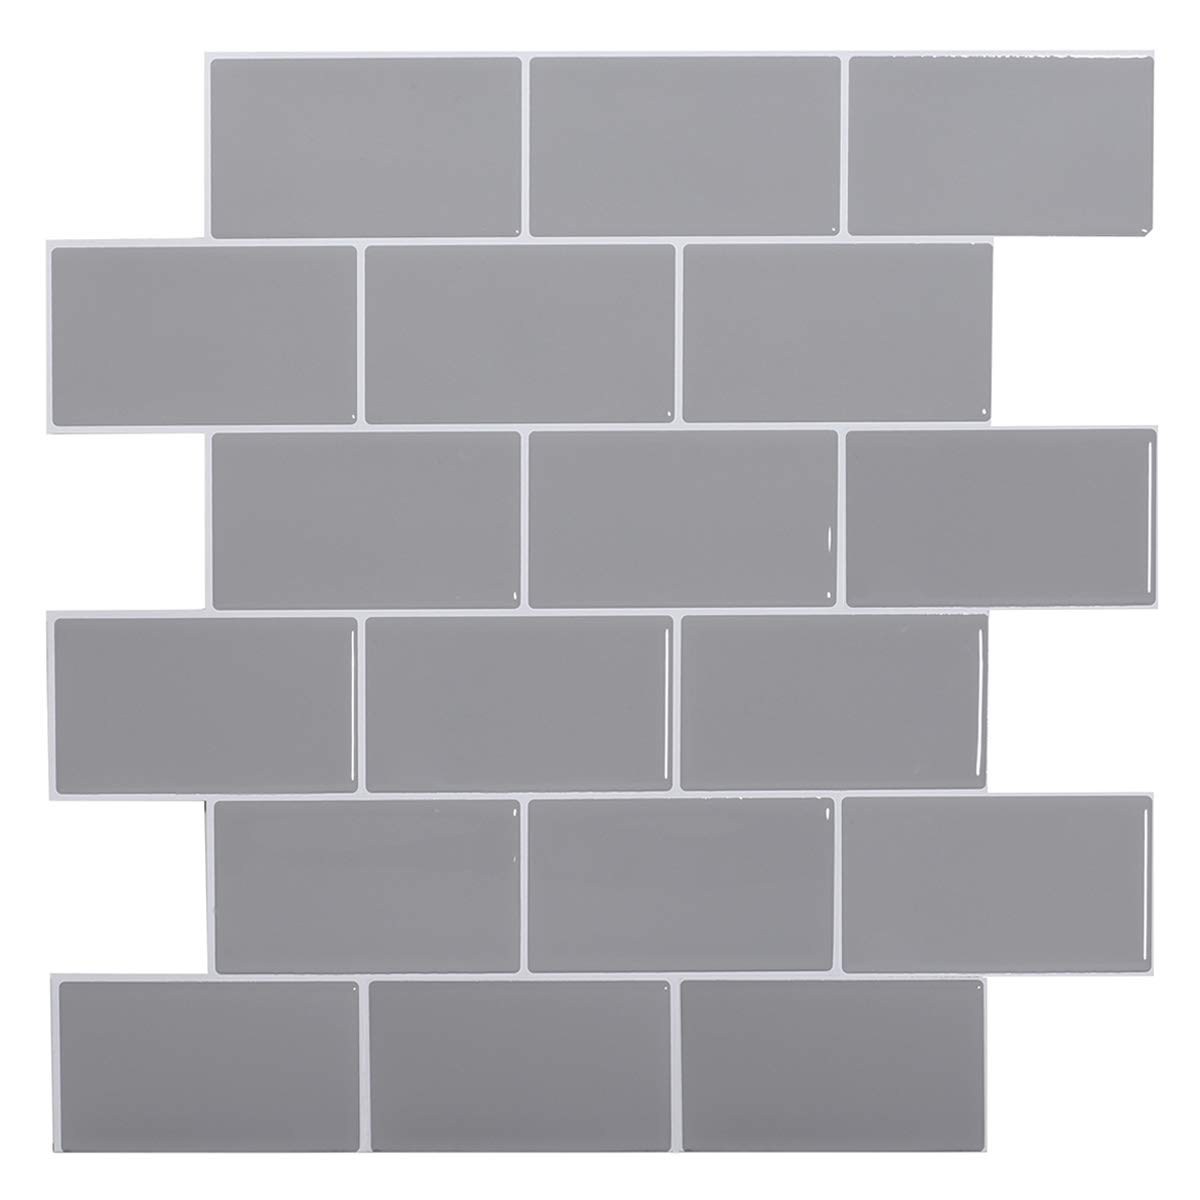 Stick on Tiles Kitchen Backsplash in Dark Grey STICKGOO Subway Tiles Peel and Stick Backsplash Pack of 1, Thicker Design